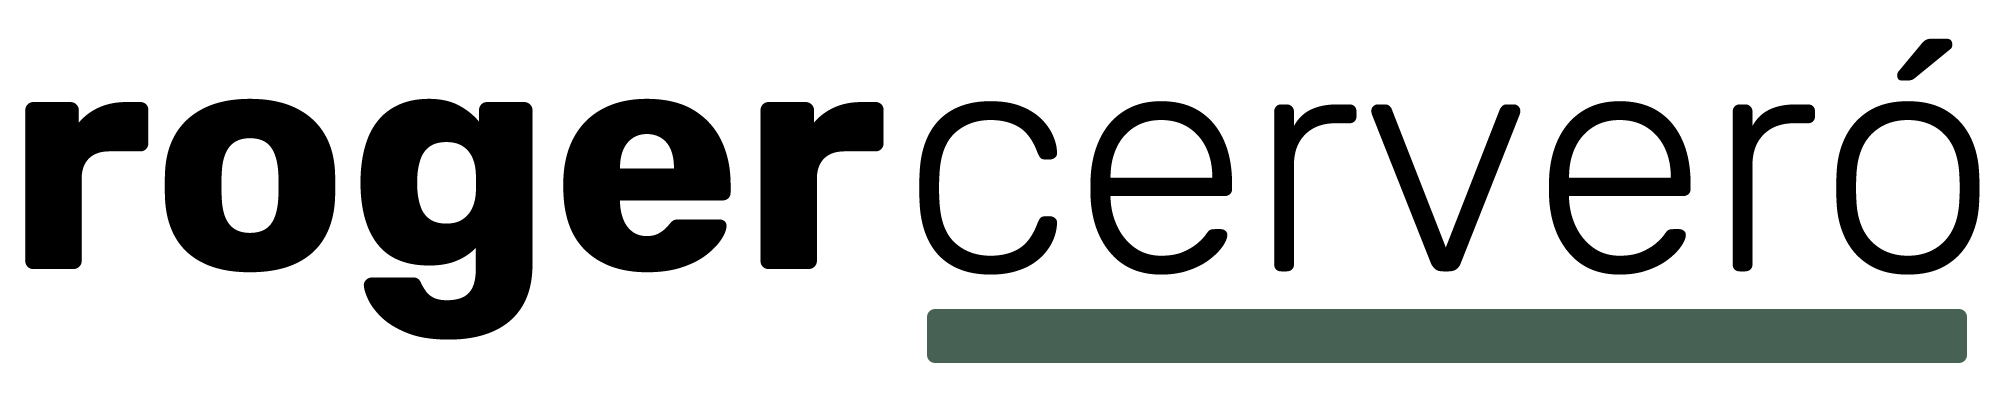 logo_rogercervero